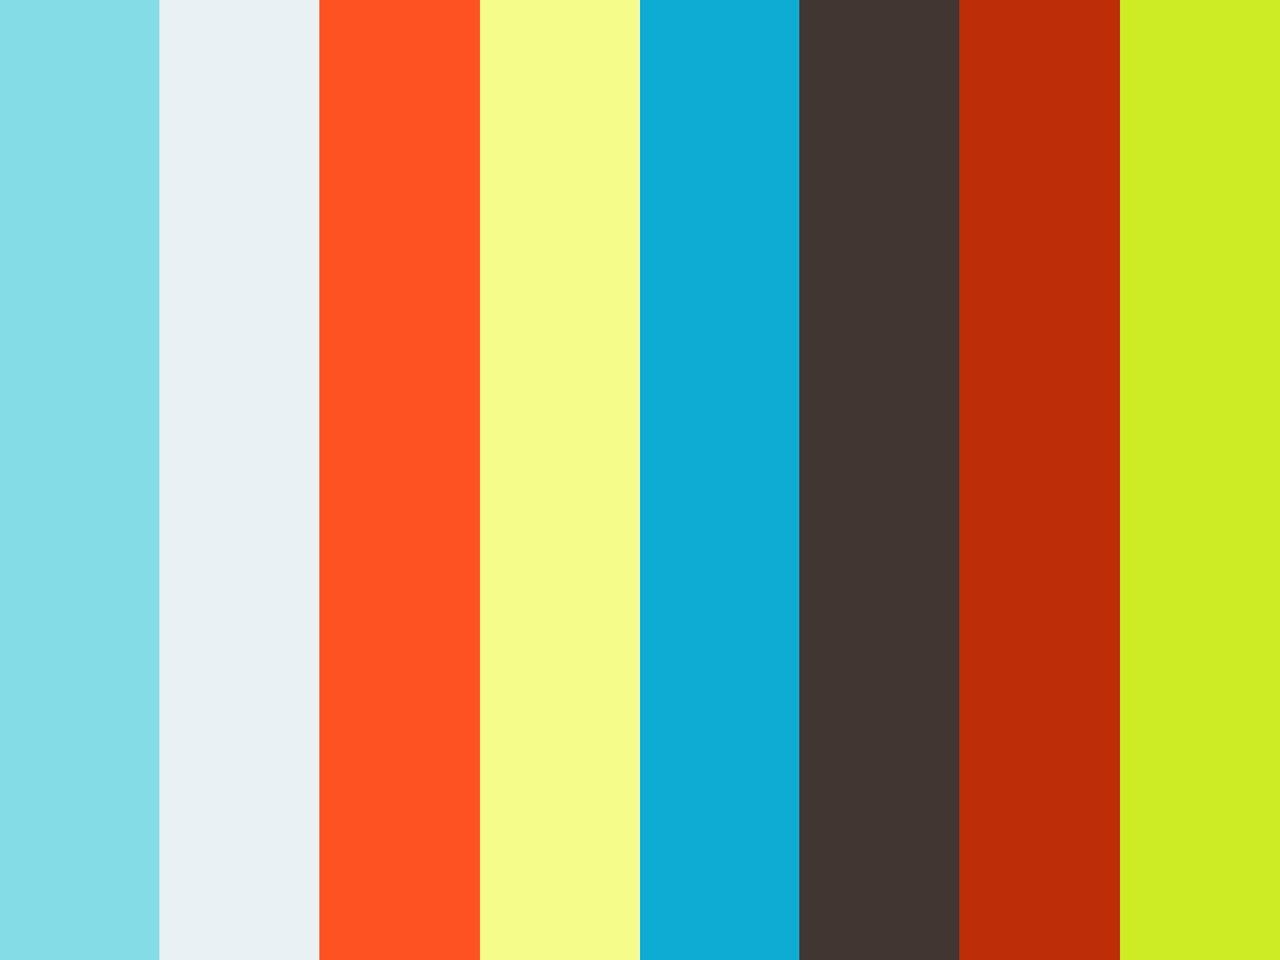 002735 - CORP - Ohlala BehaKlas - Tip 10 - Naadloze beha